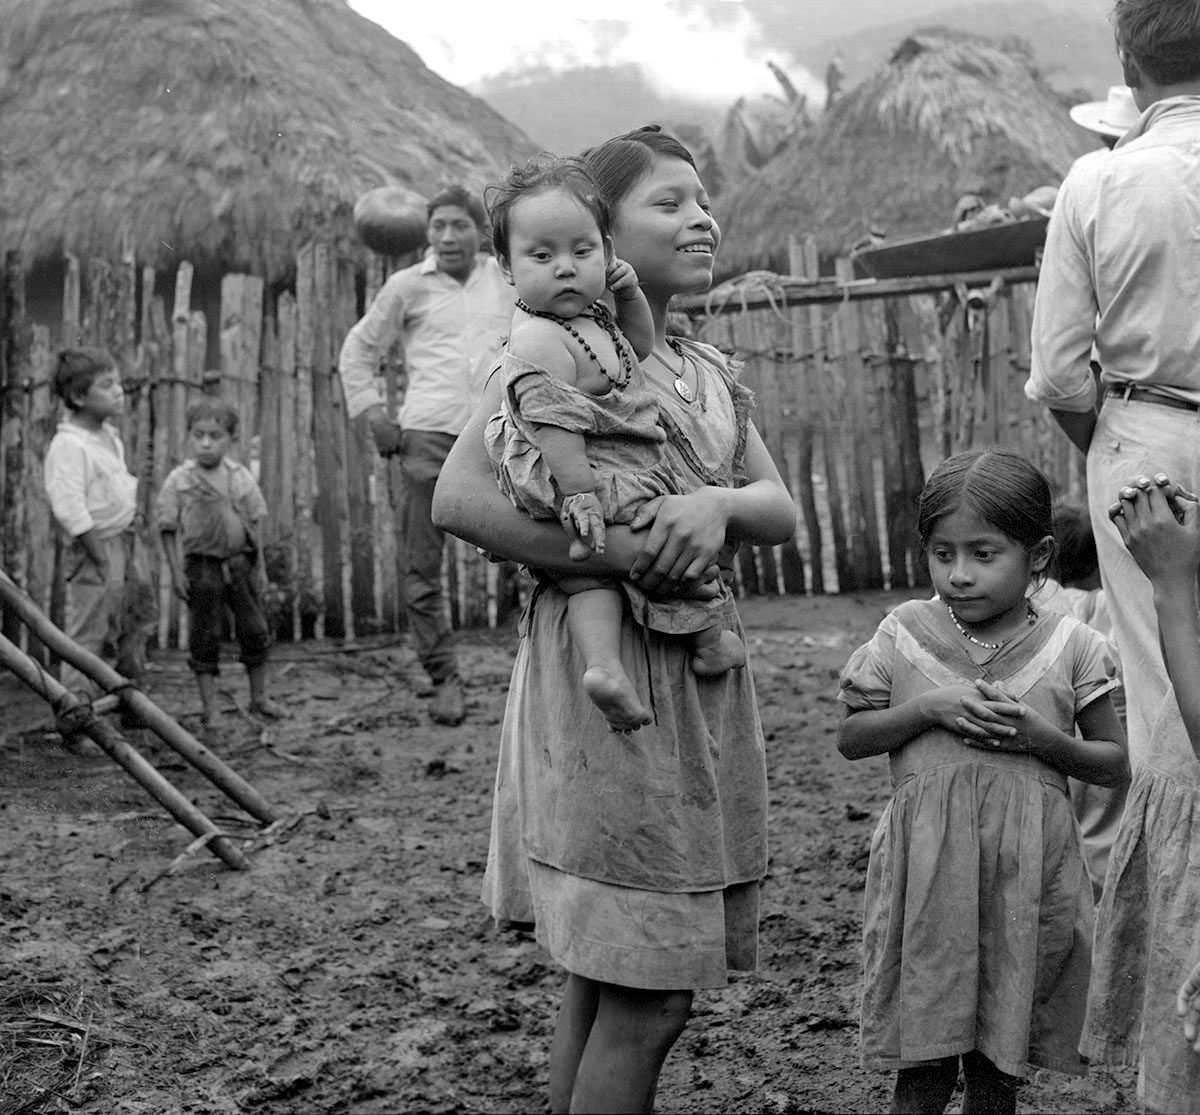 Mom and Baby Yashakintala Chiapas